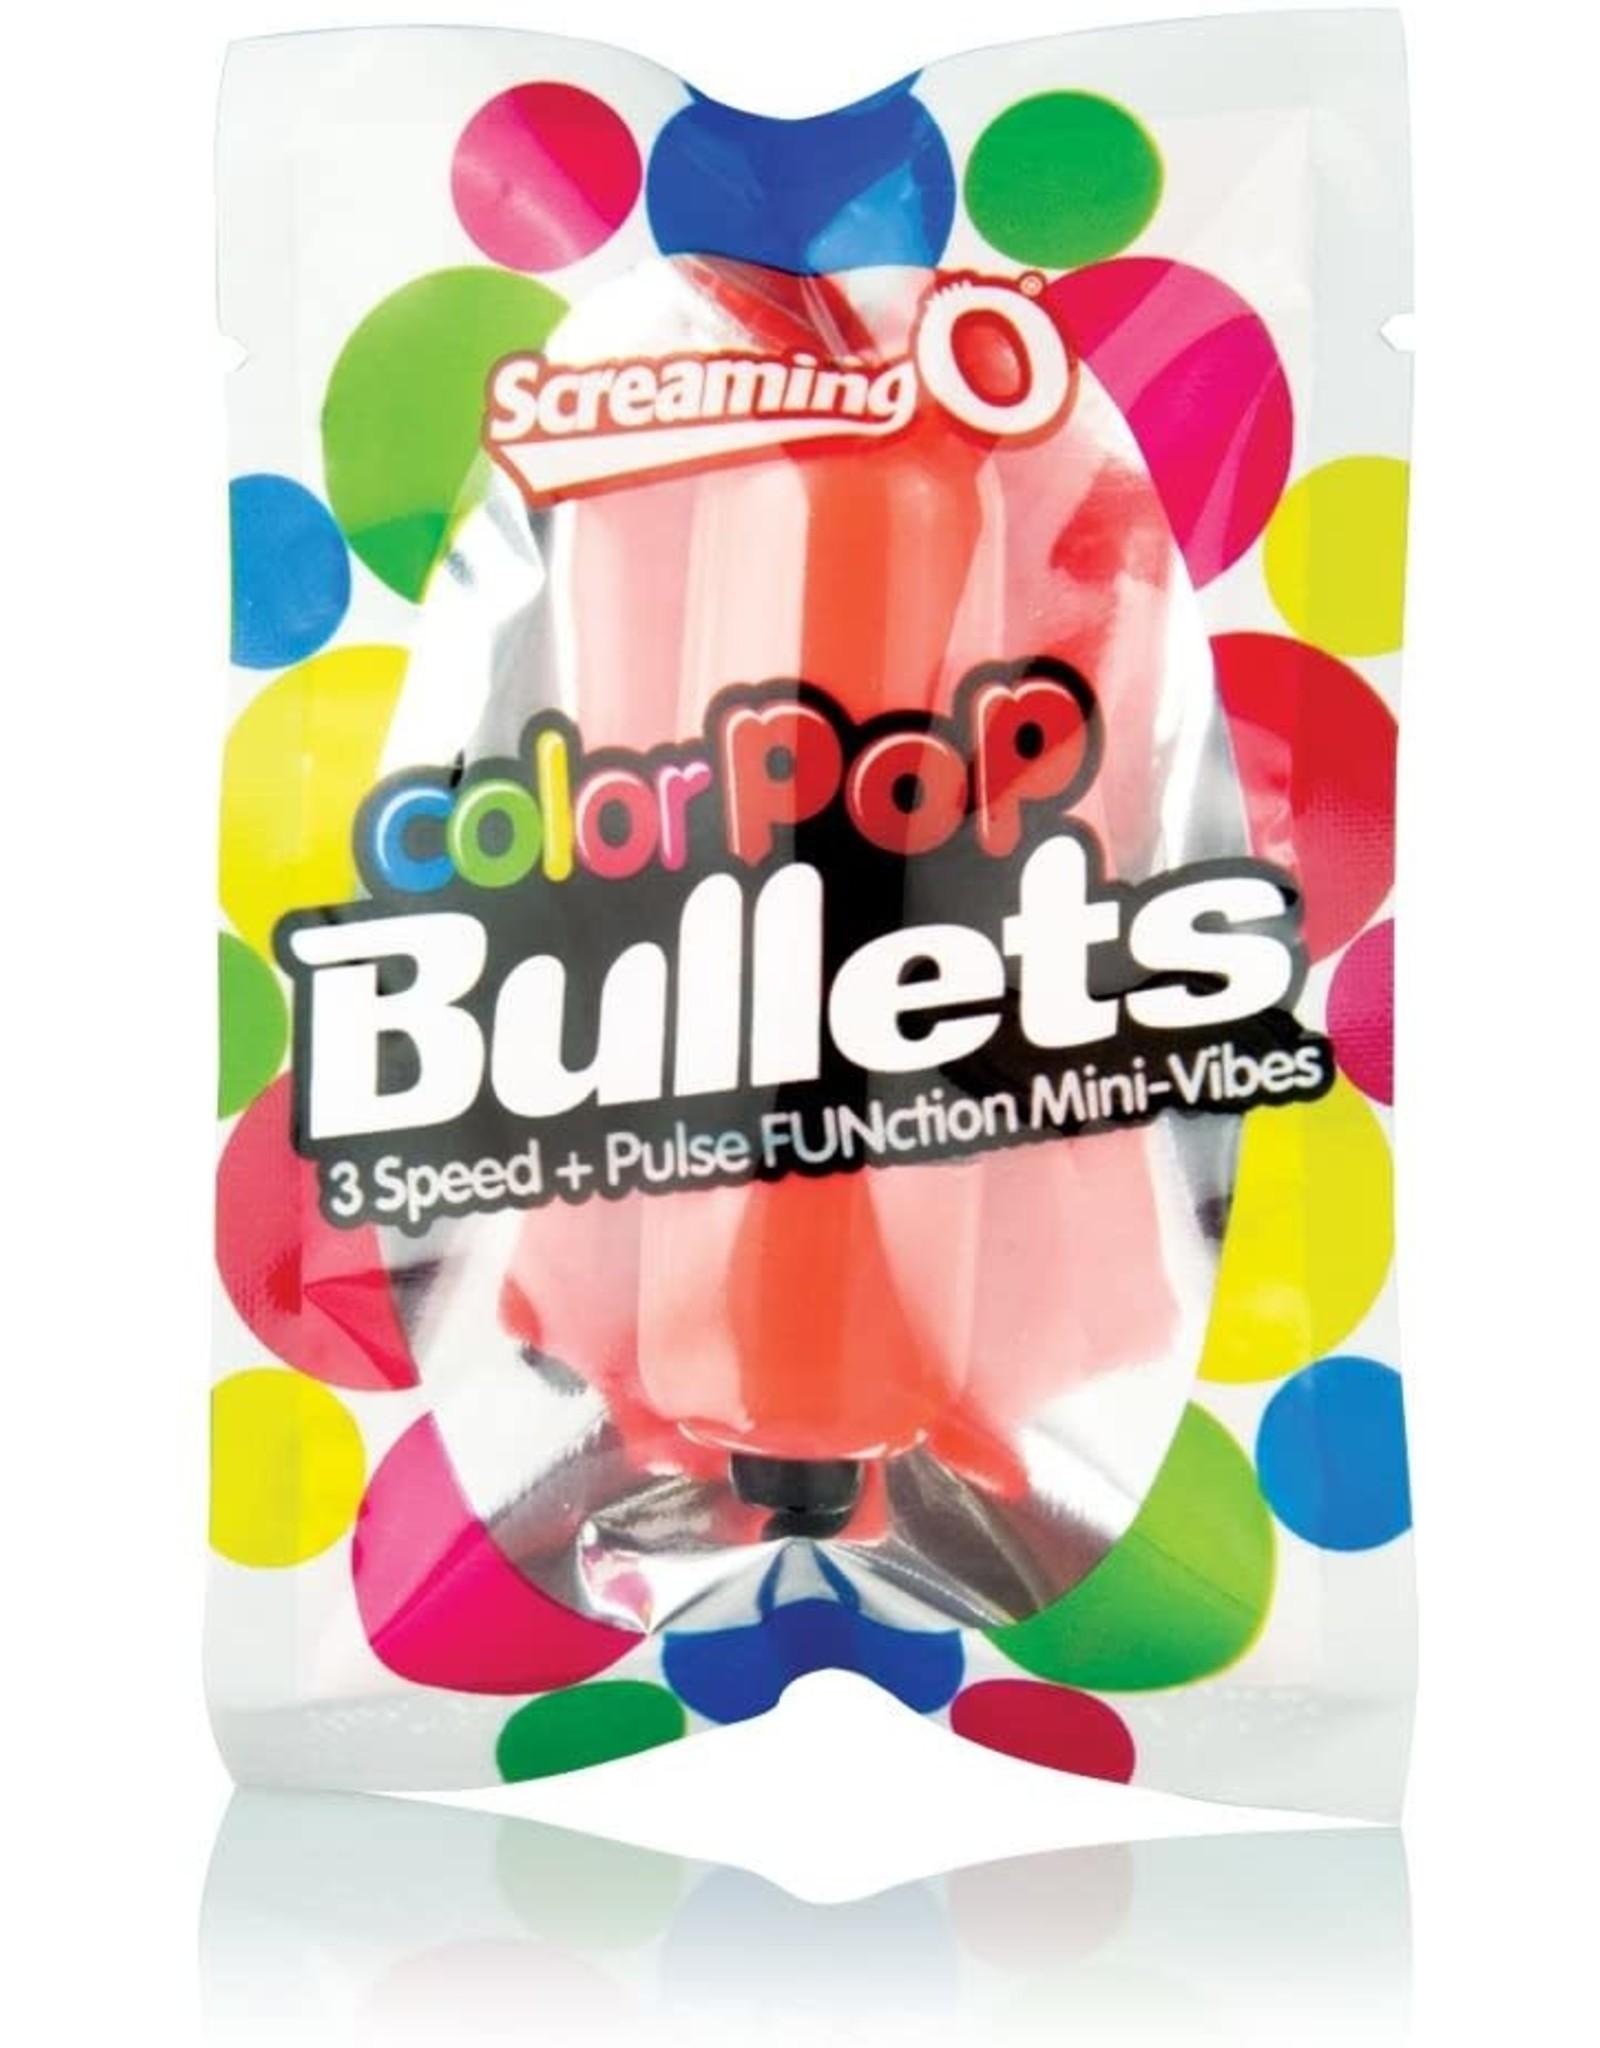 SCREAMING O - COLOR POP 3 SPEED BULLET - ORANGE